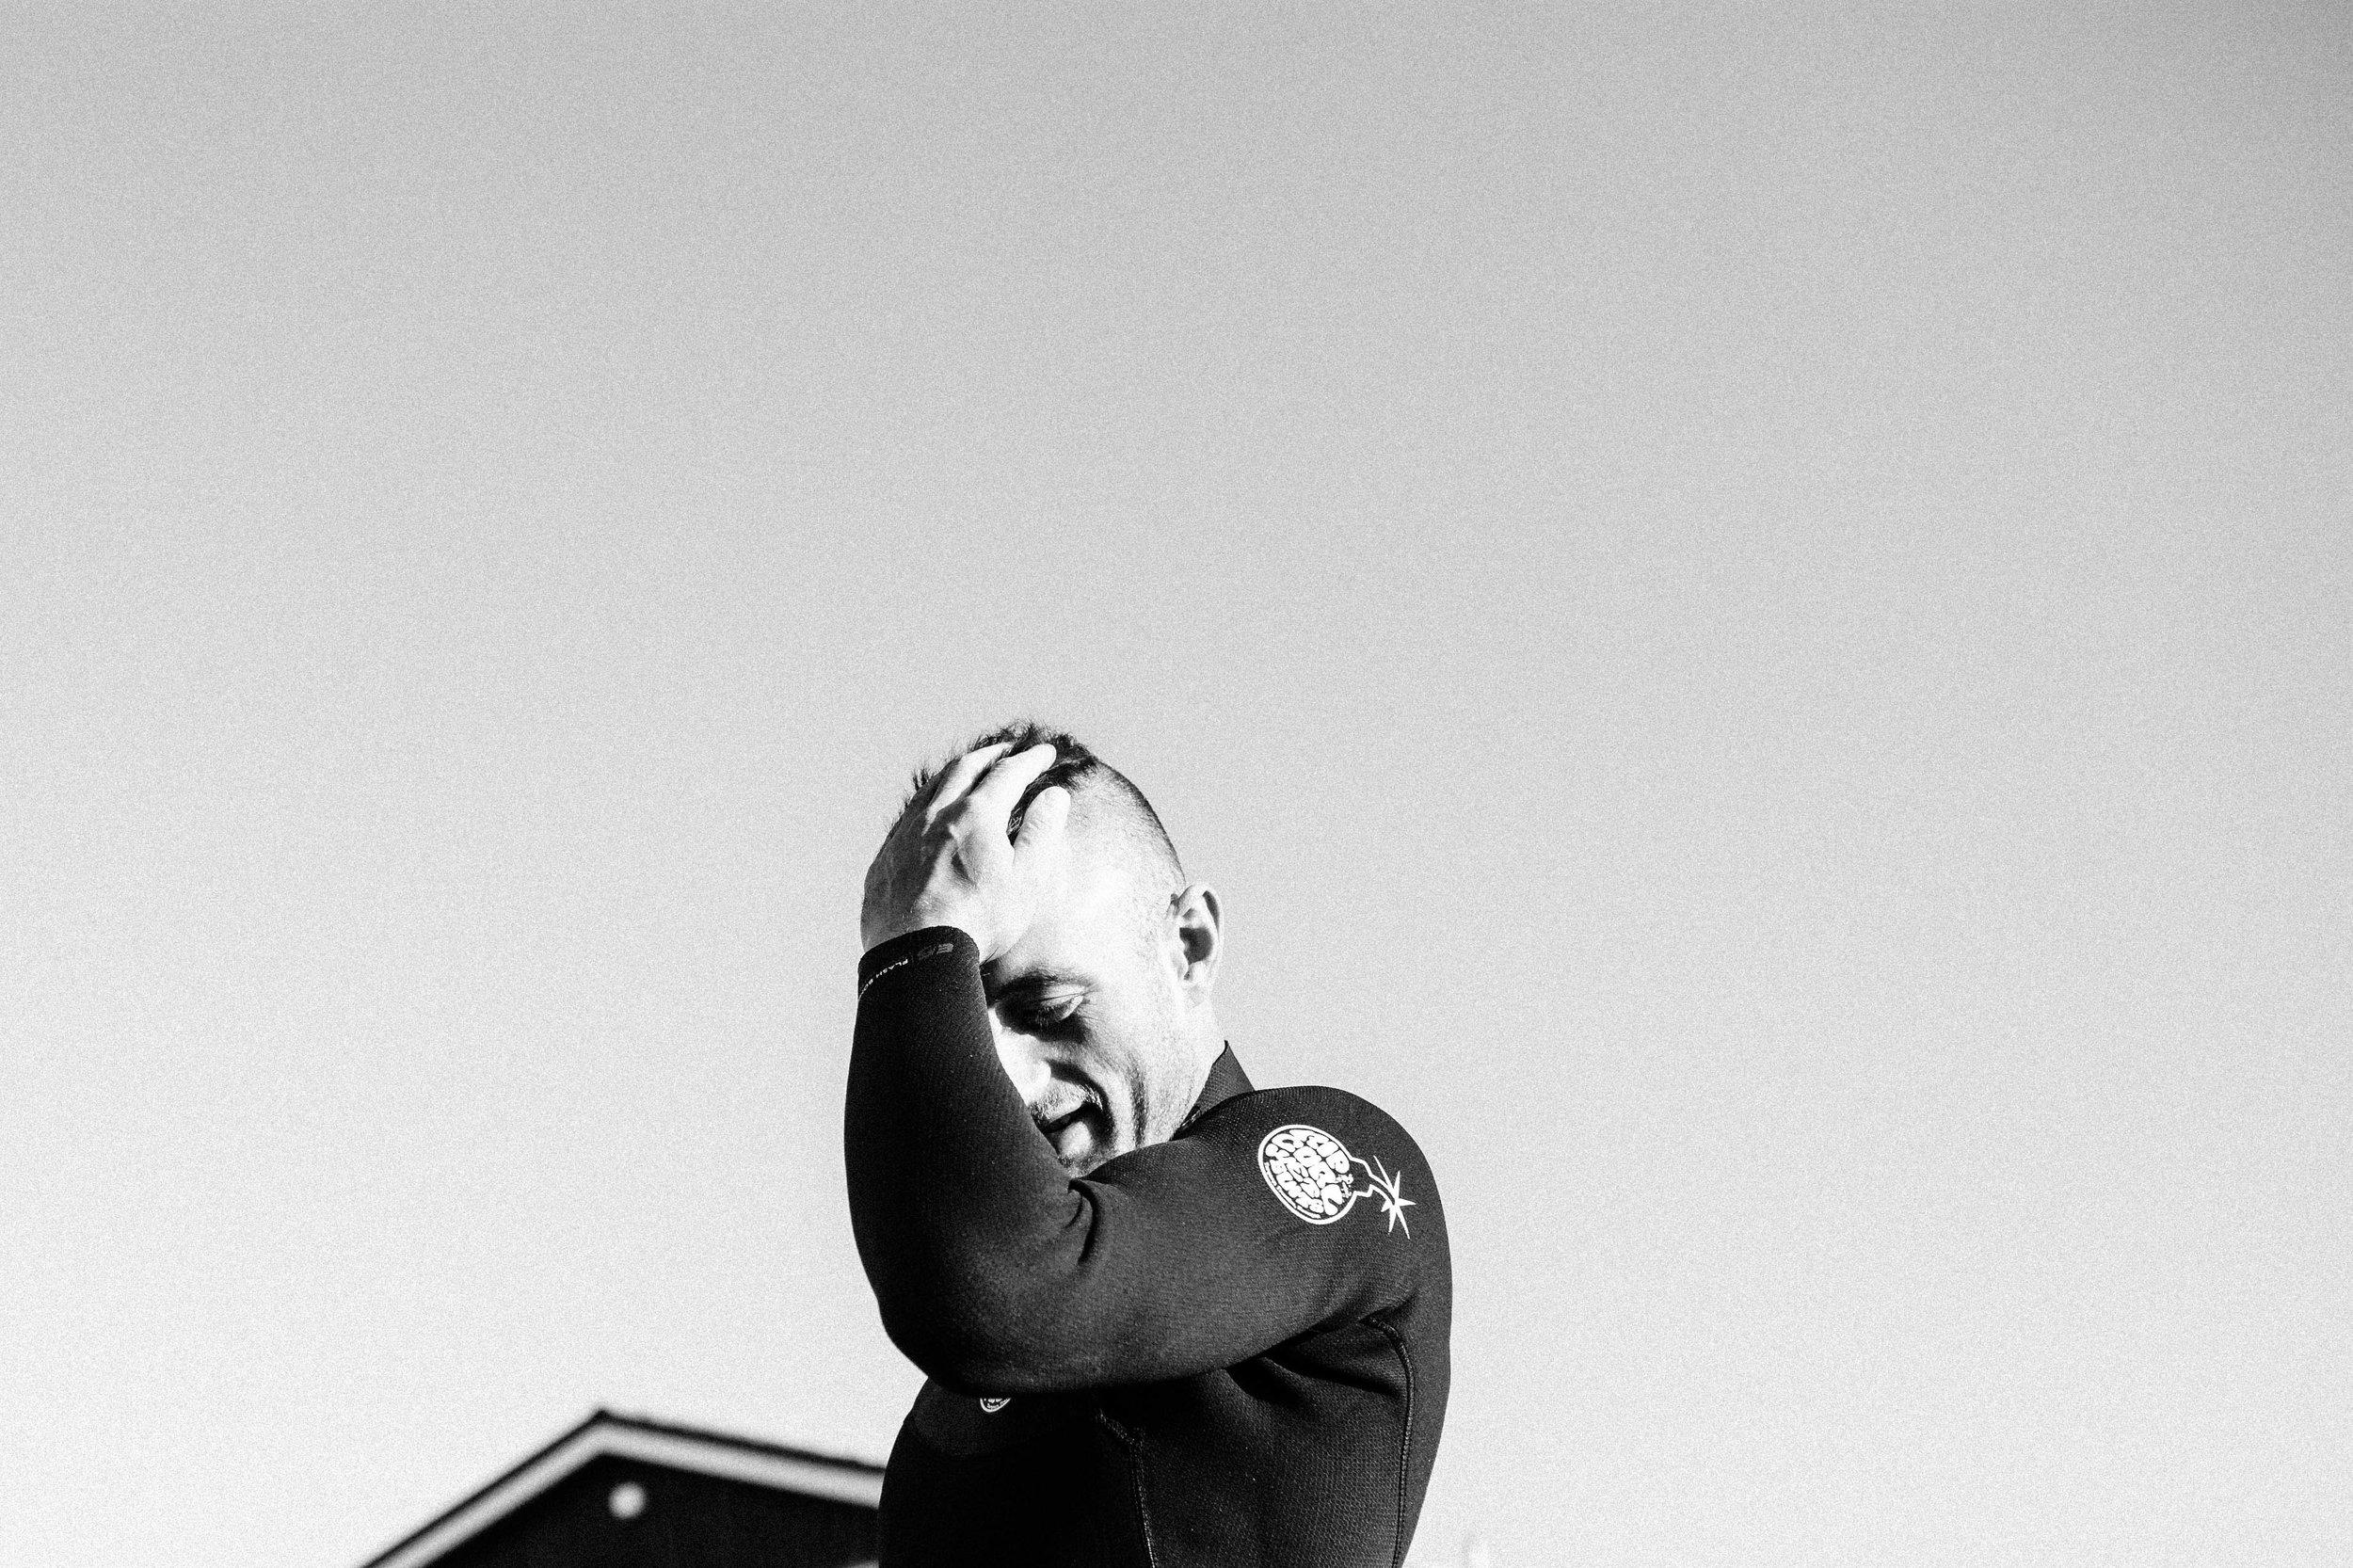 Alex_Sedgmond_Photography-Cardiff-SouthWales-PorthcawlRestbay-Surfing-EzraHames-16.jpg